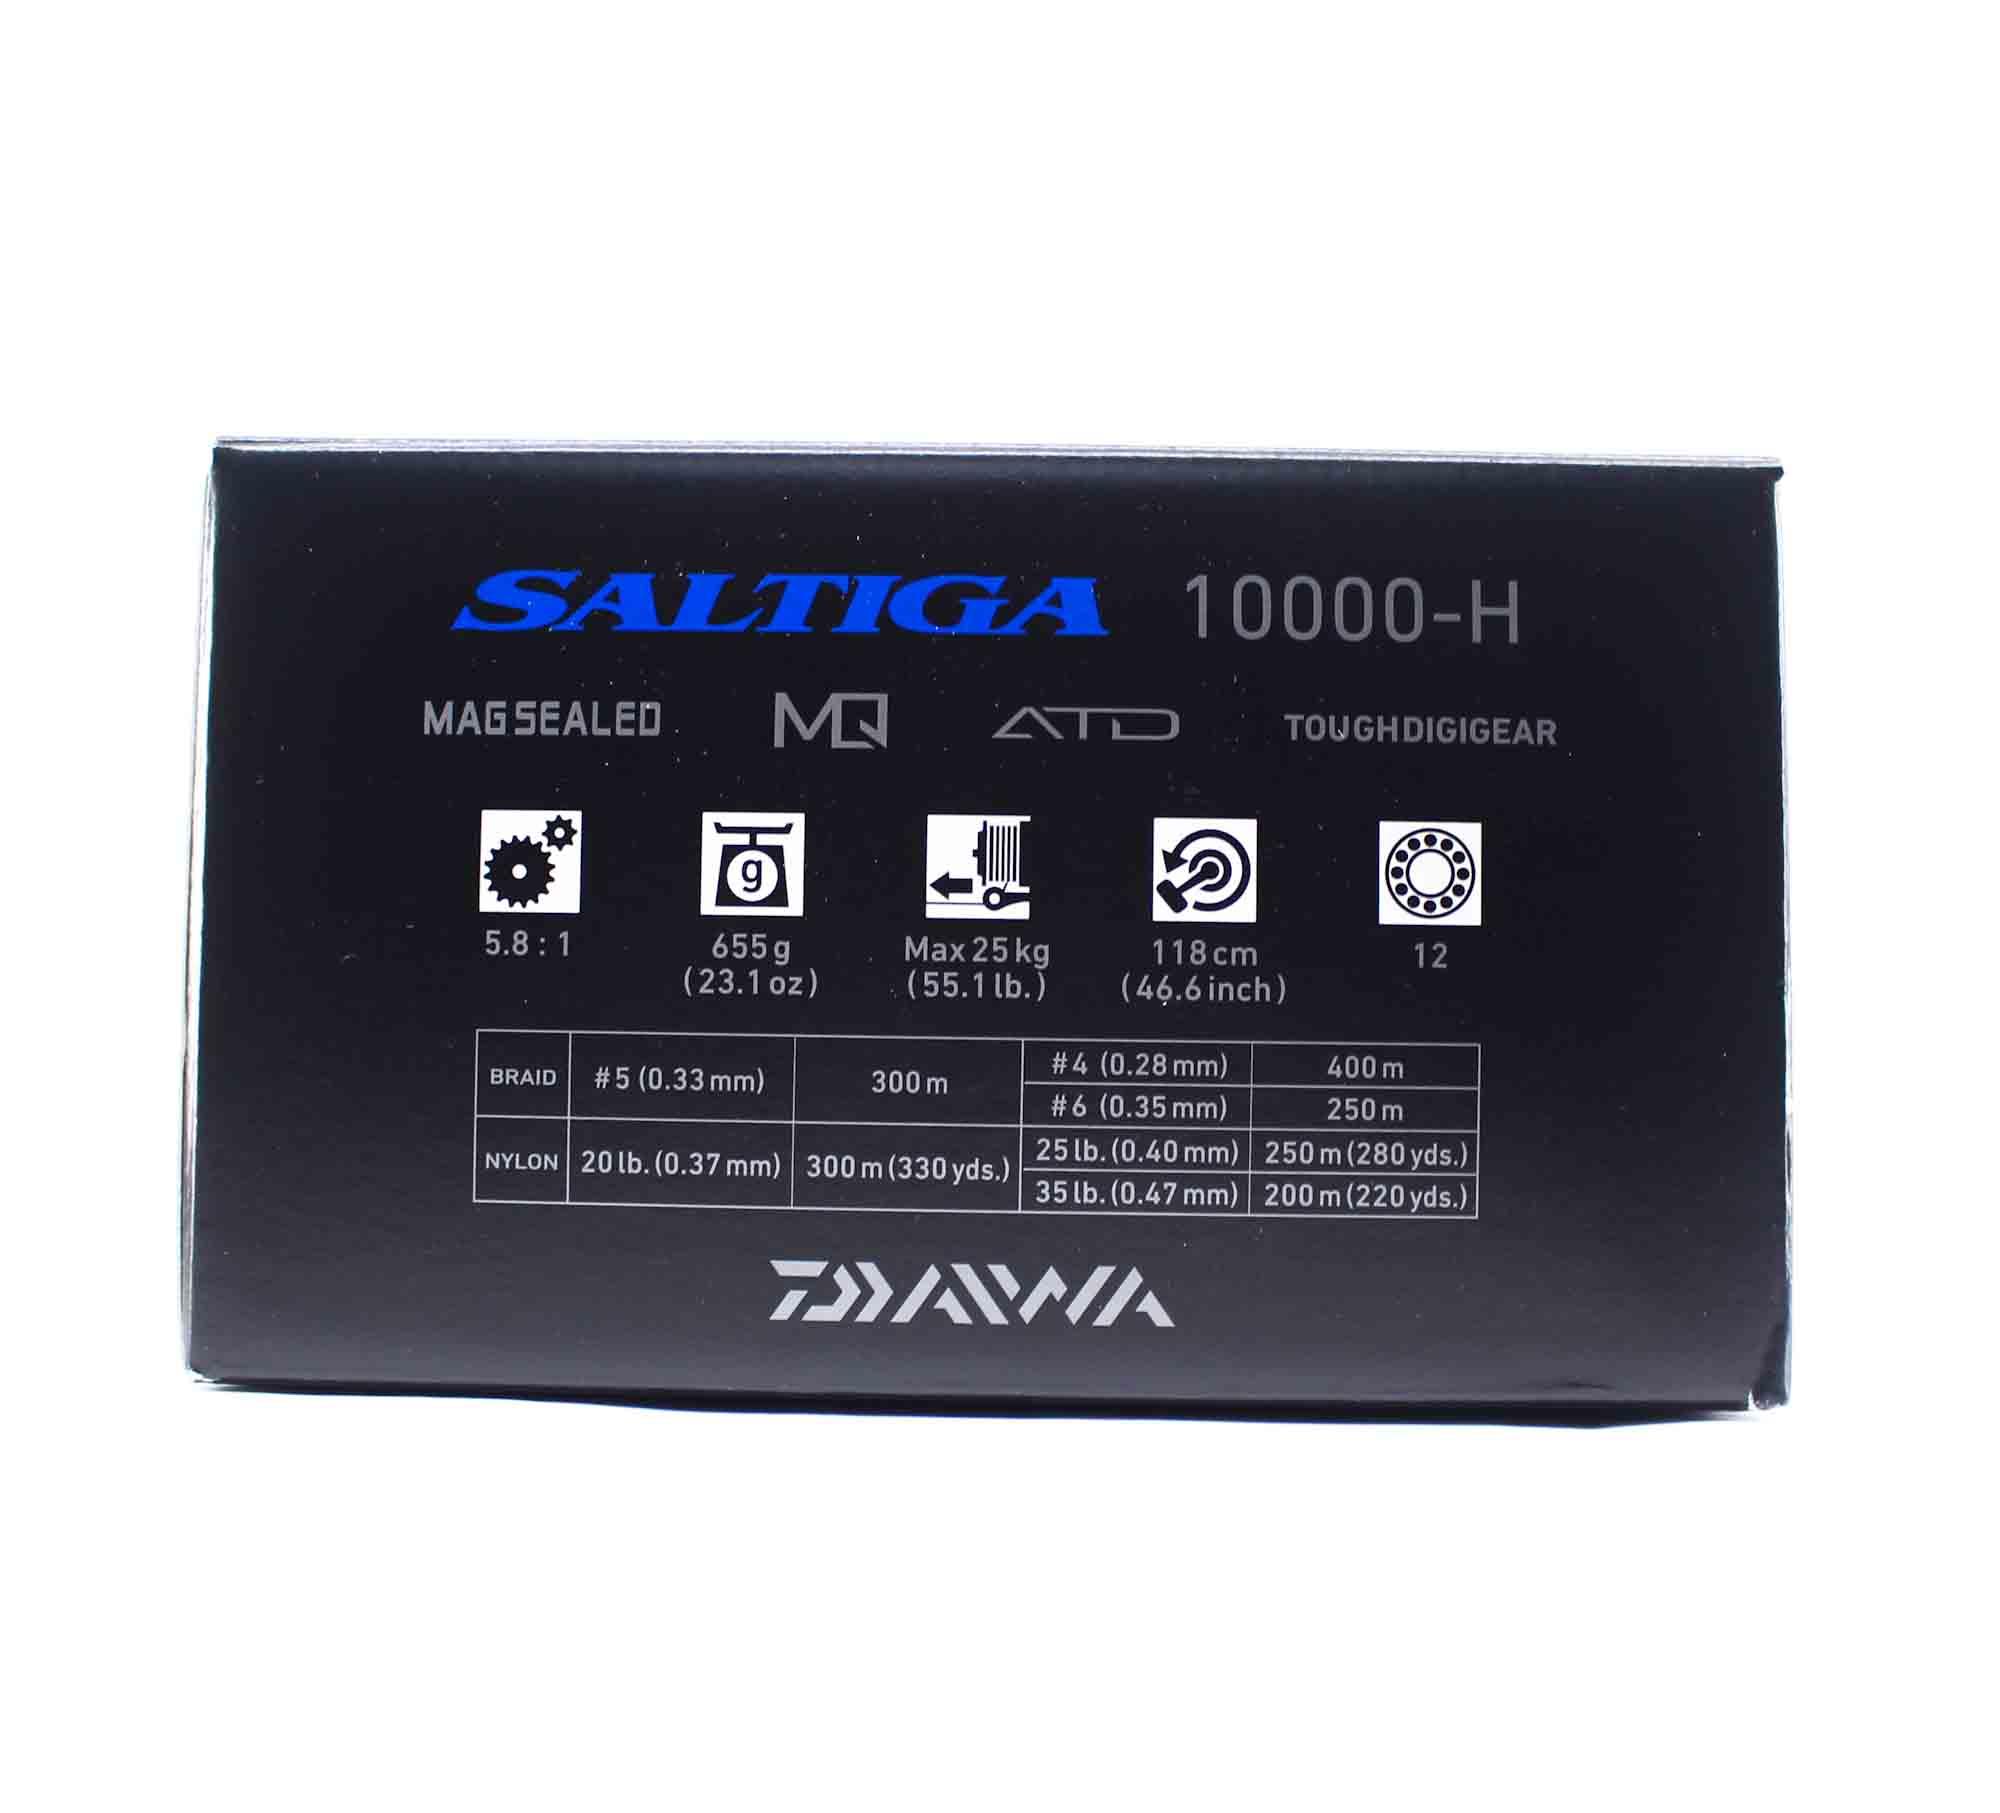 Daiwa Reel Spinning 2020 Saltiga G 10000 H (9976)